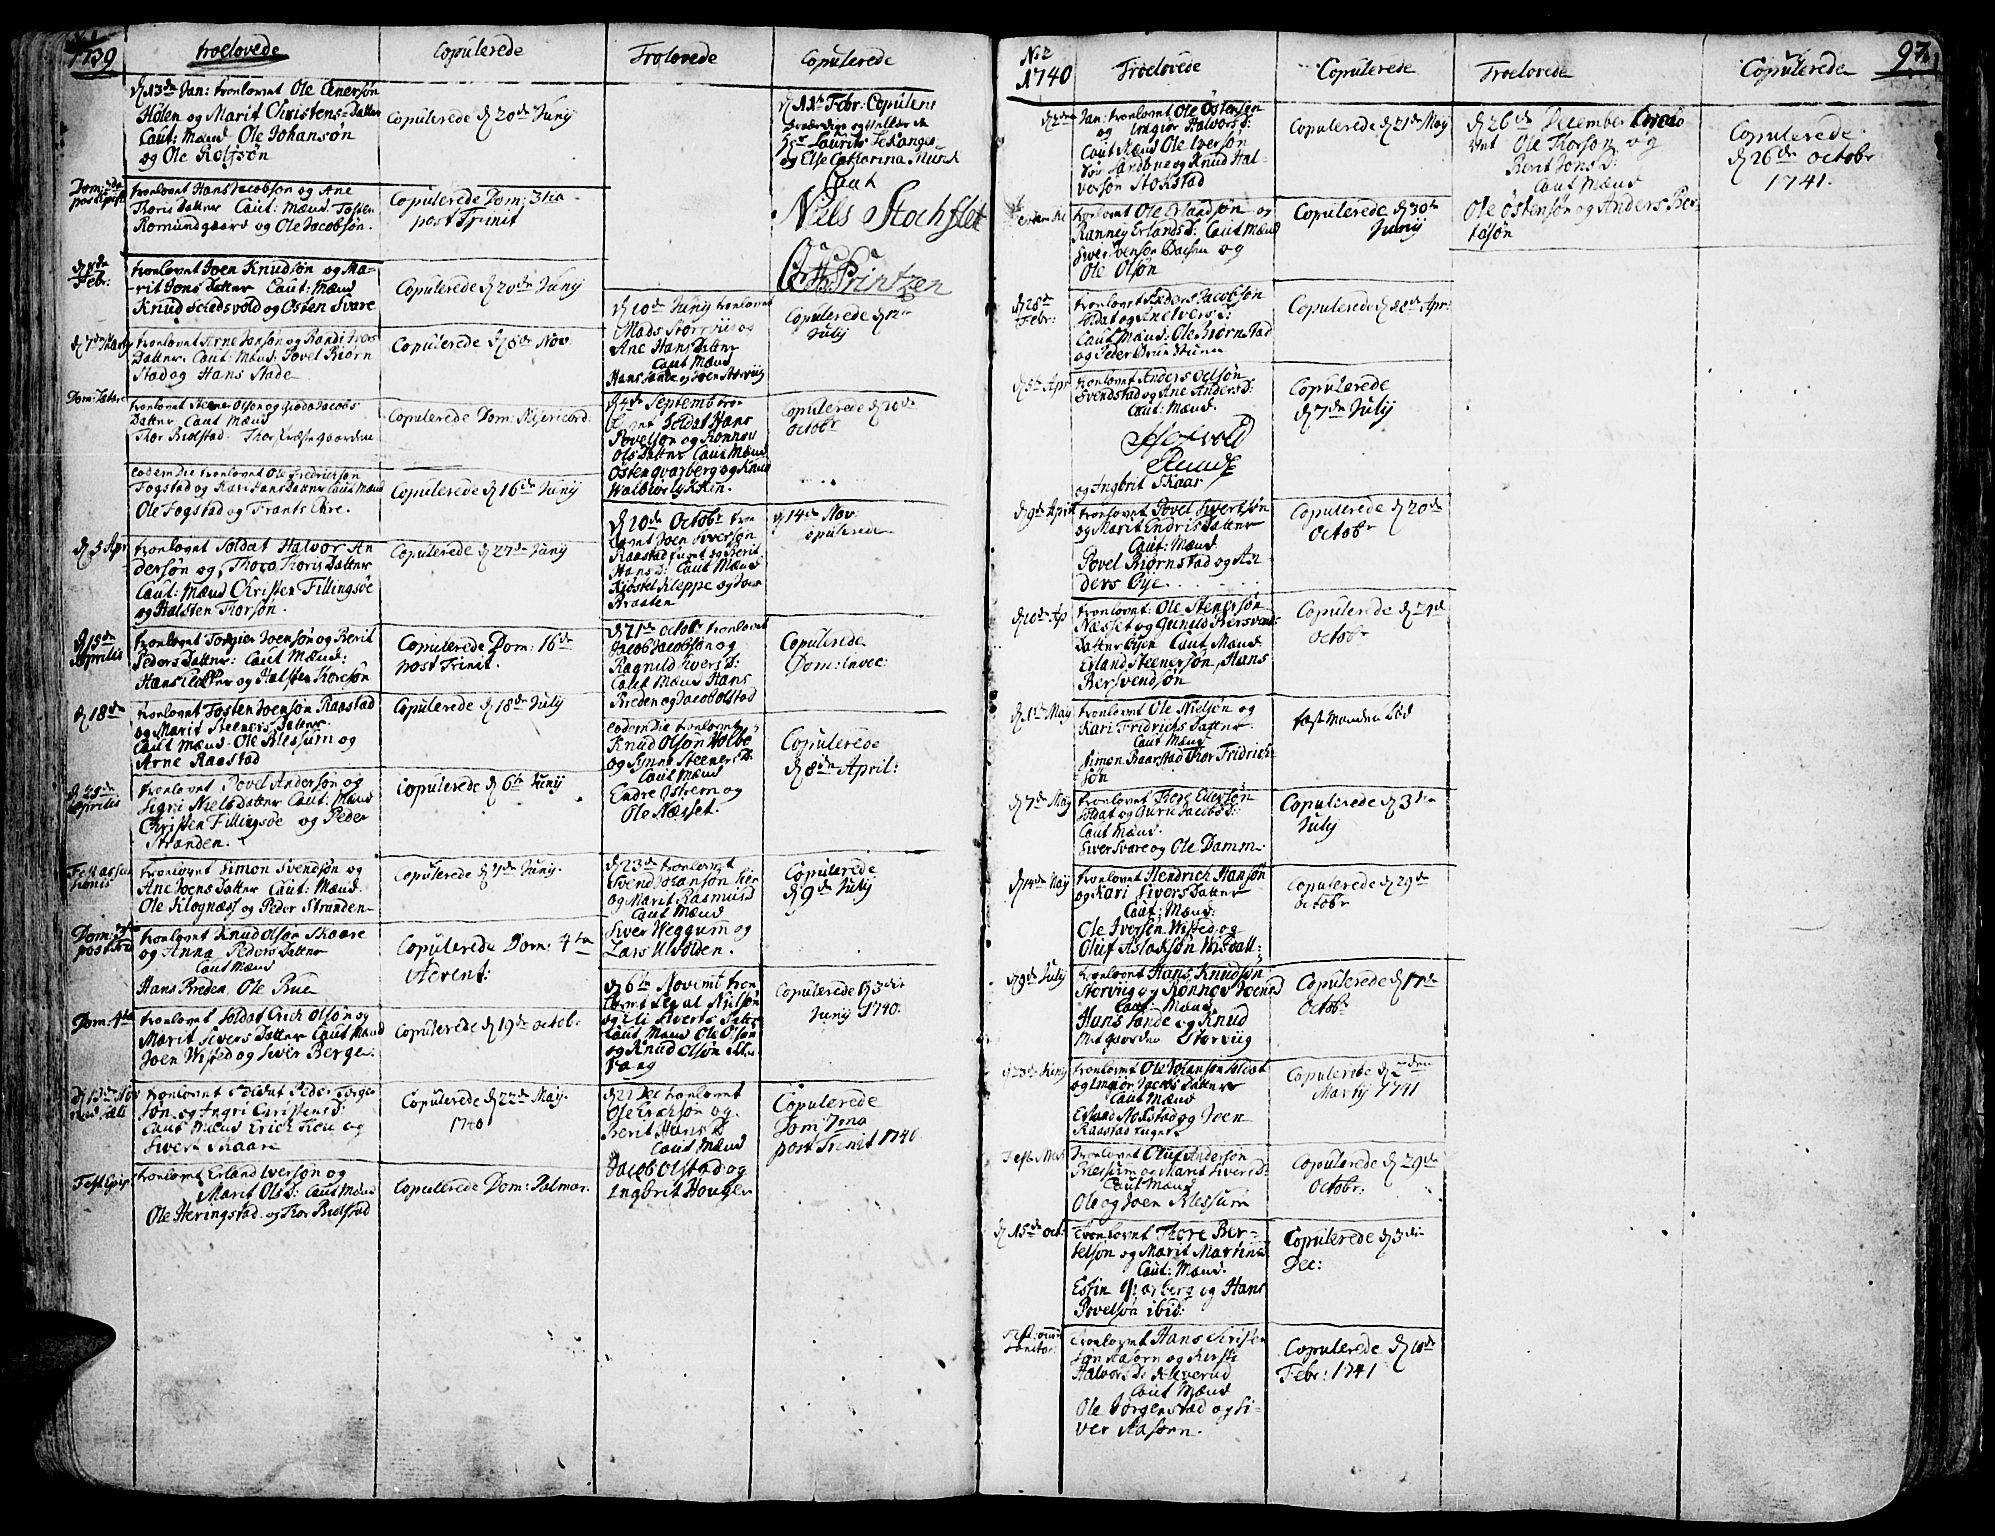 SAH, Vågå prestekontor, Ministerialbok nr. 1, 1739-1810, s. 97